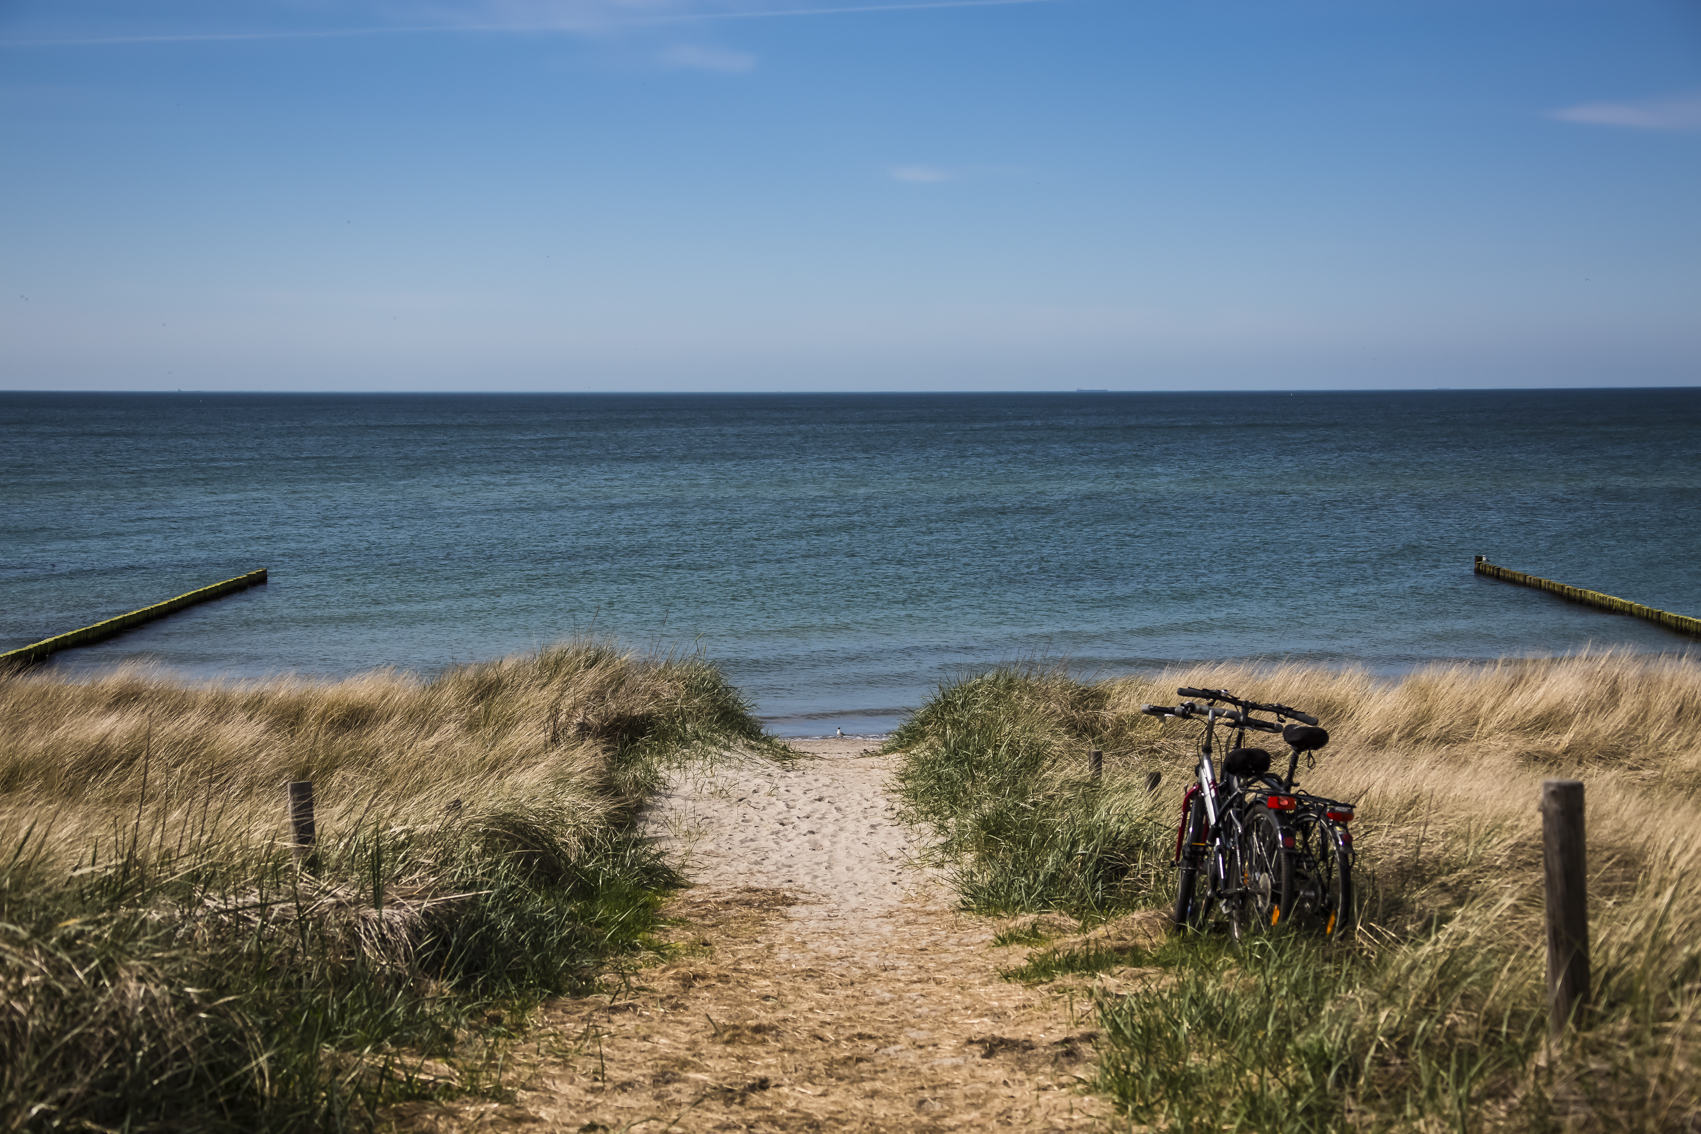 Strandübergang FeWos Del Mar Zingst